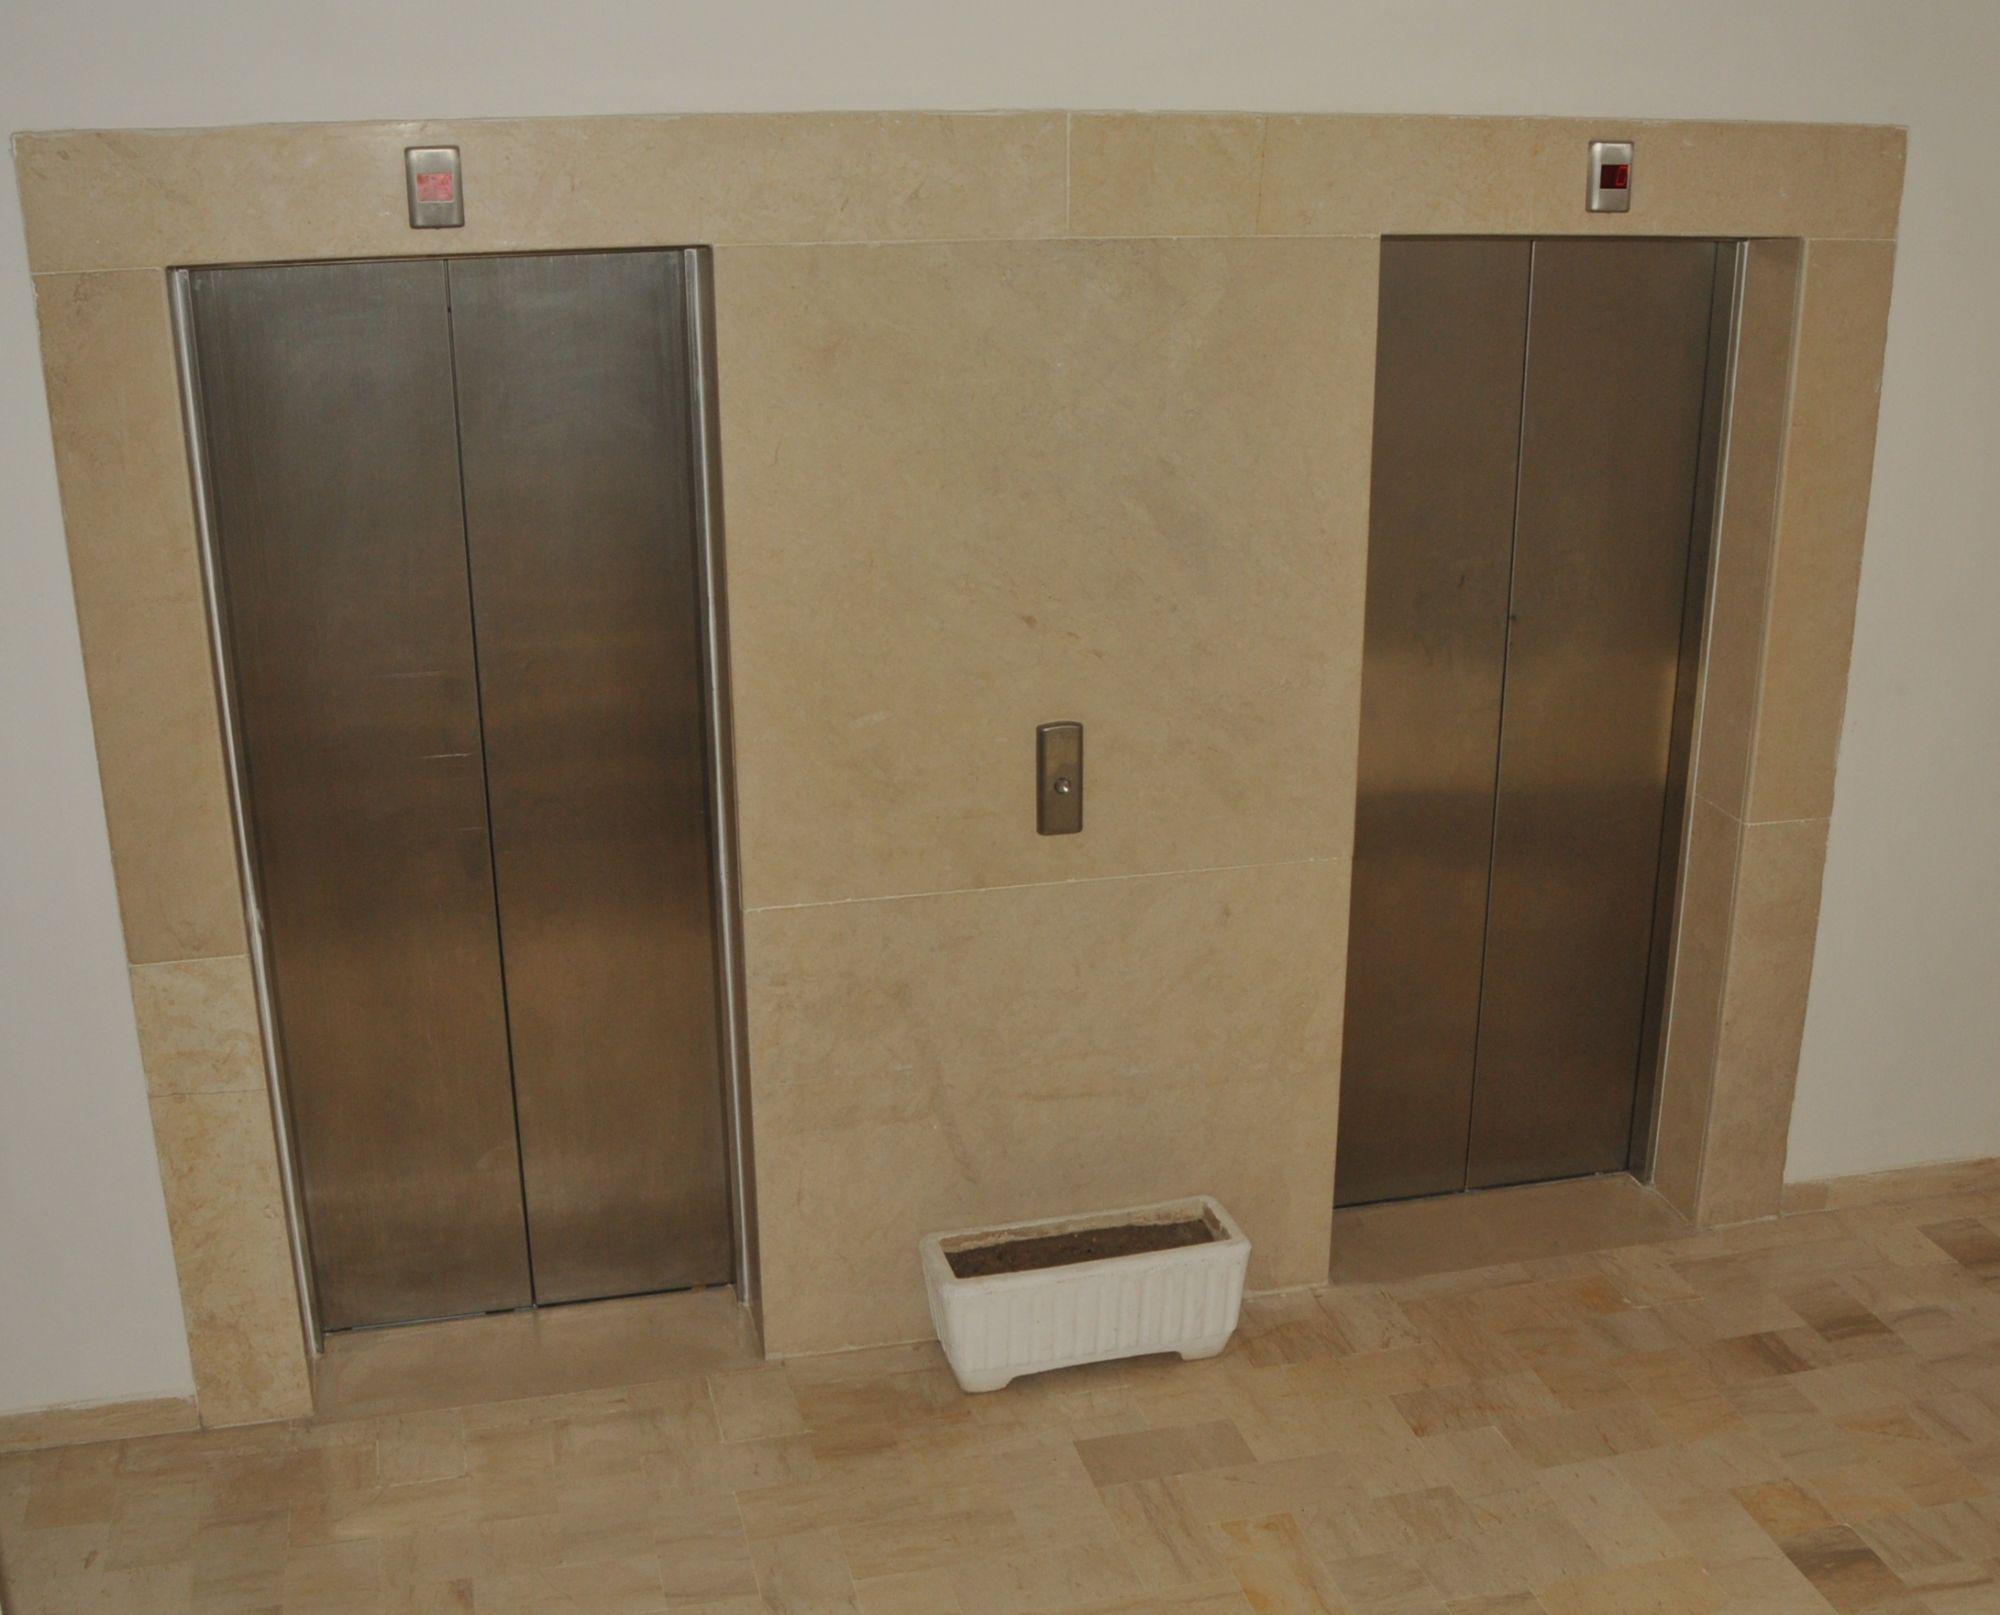 a vendre un joli appartement a tunis ainzaghouan diair soukra vente appartement cit el mhiri. Black Bedroom Furniture Sets. Home Design Ideas